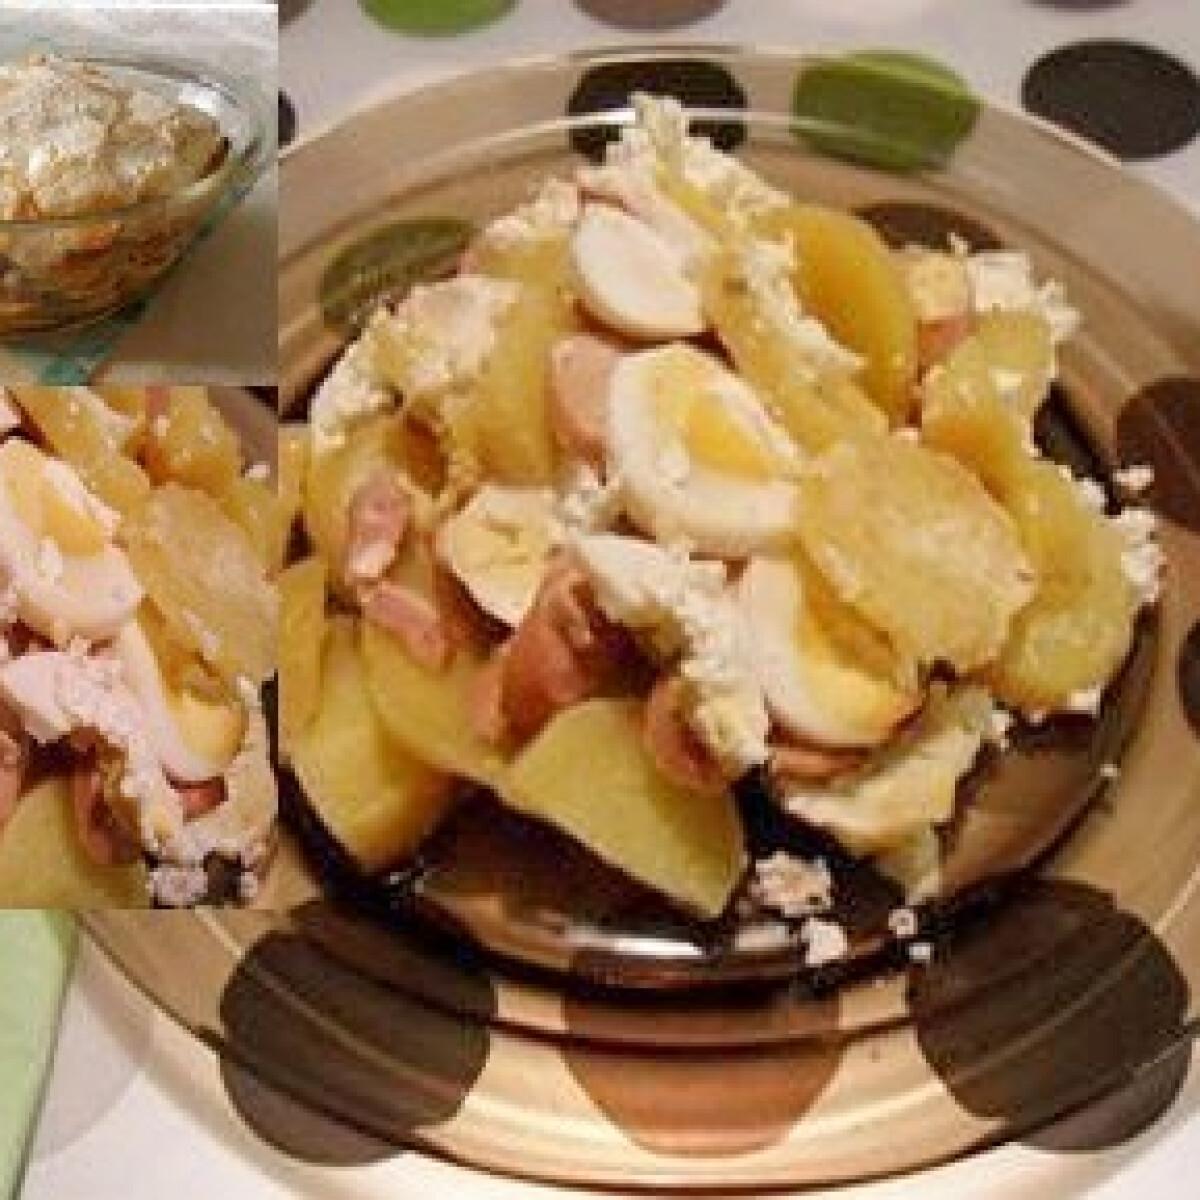 Gyerekbarát rakott krumpli virslivel